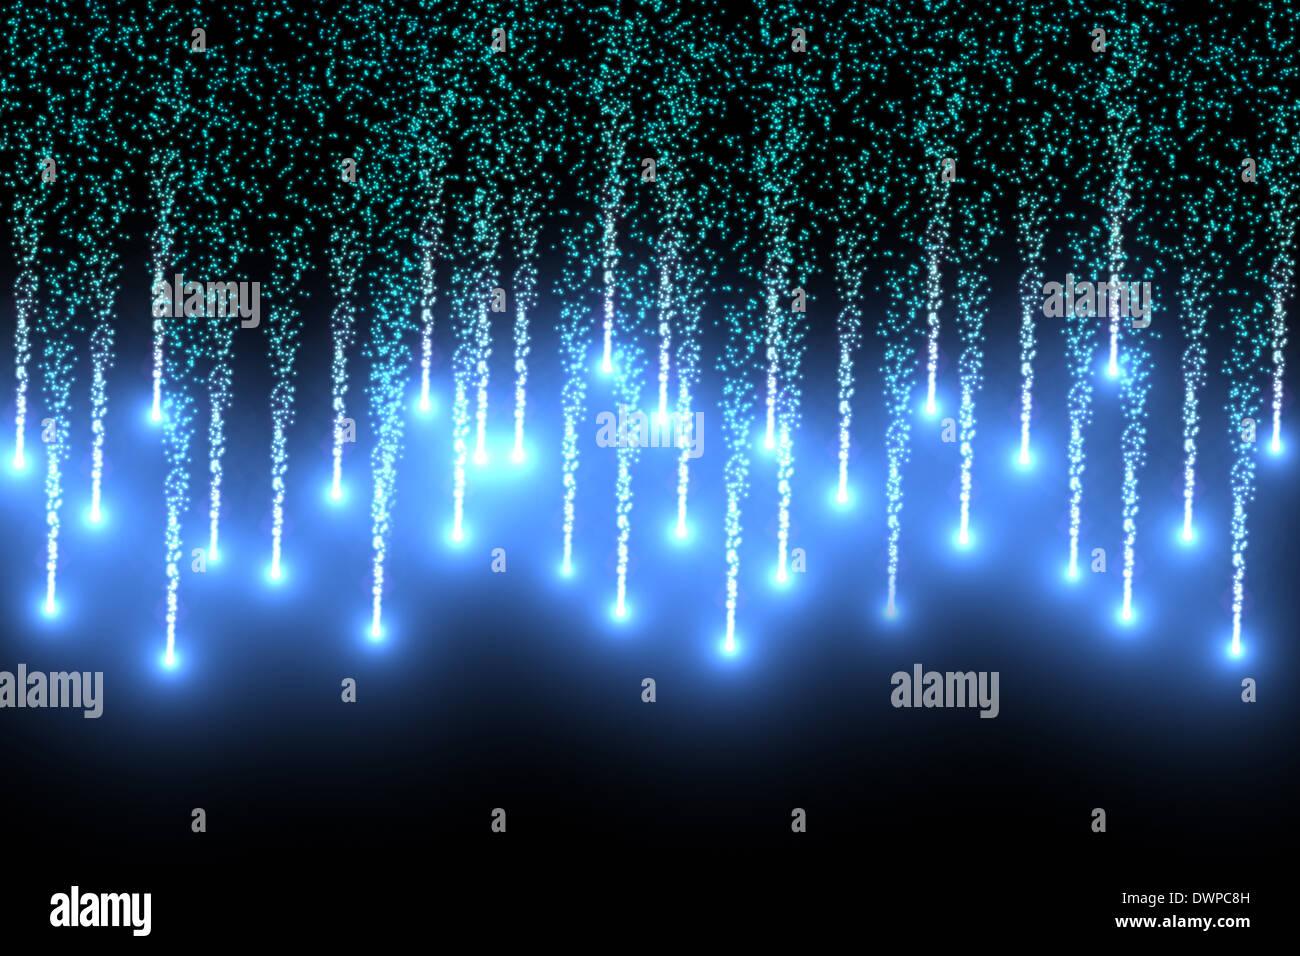 Digitally generated firework design - Stock Image